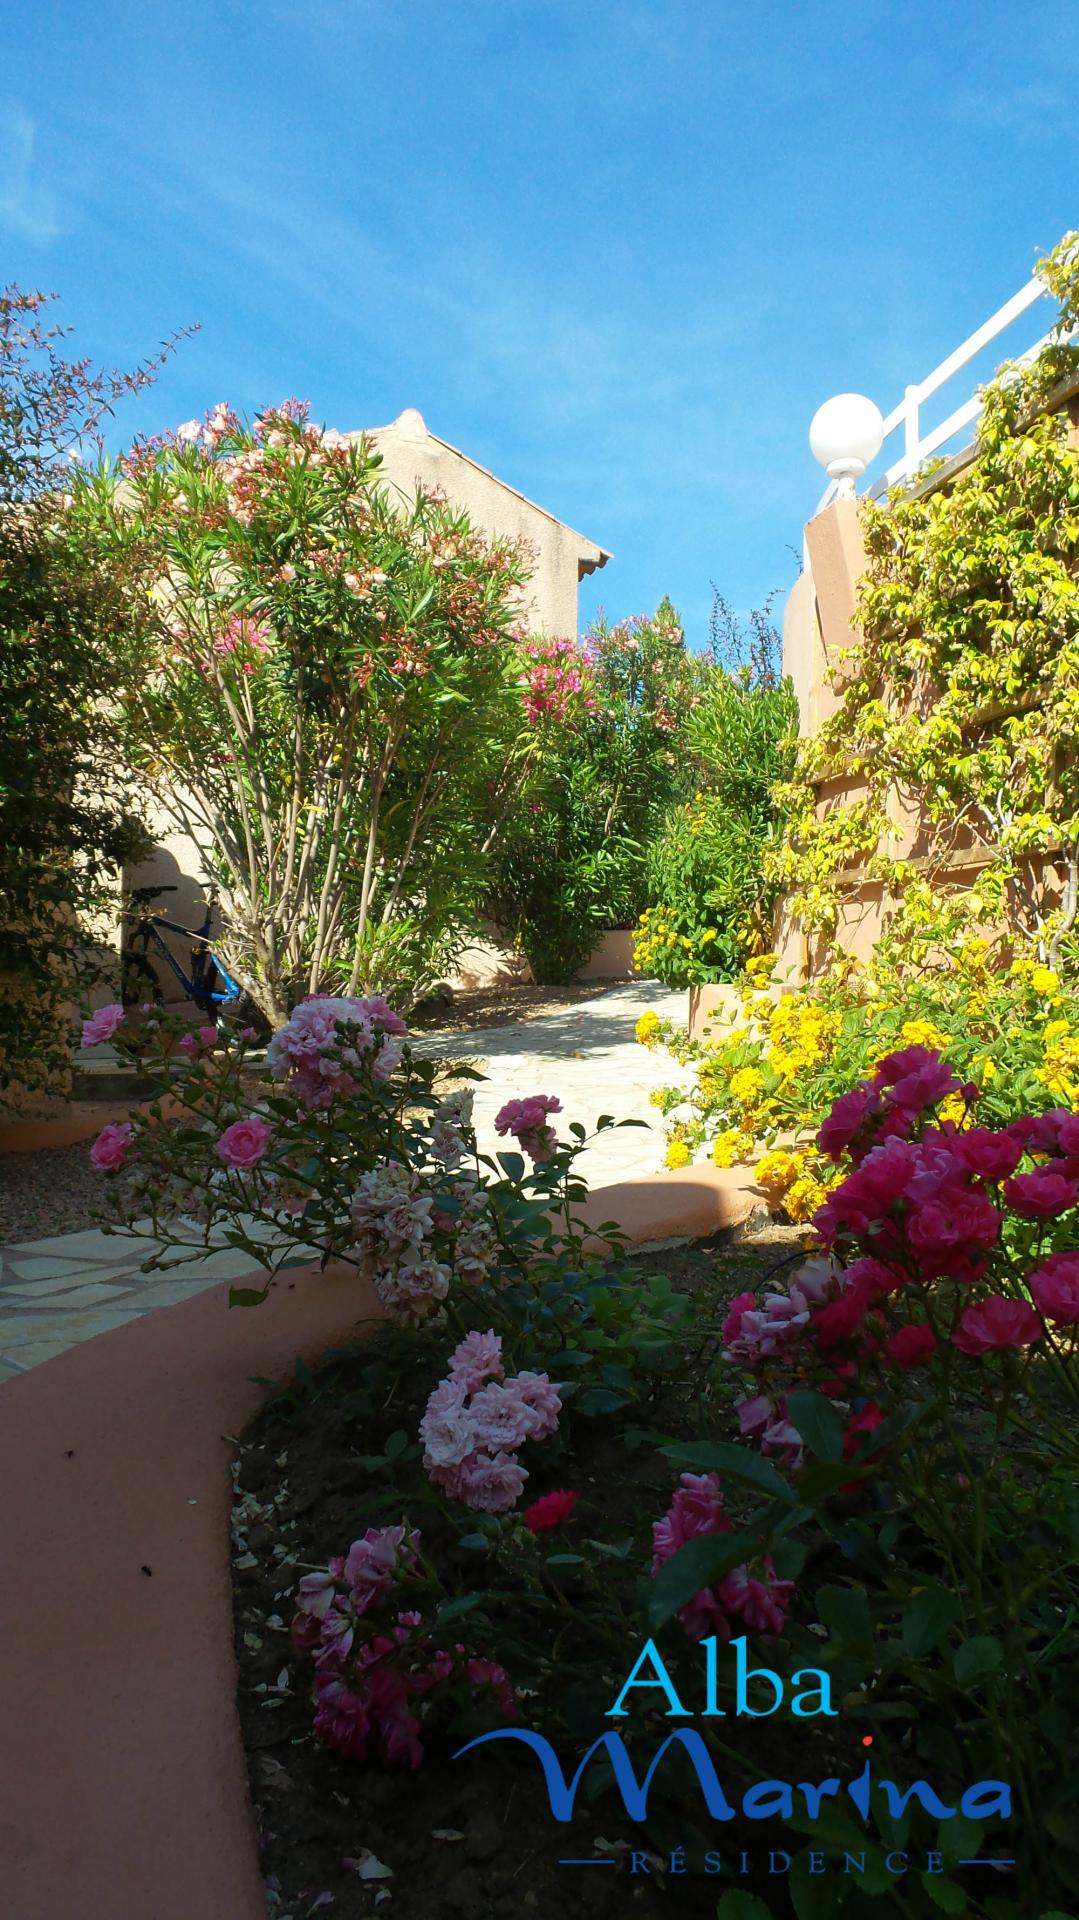 Hébergement de vacances Porto Vecchio Pinarello Corse